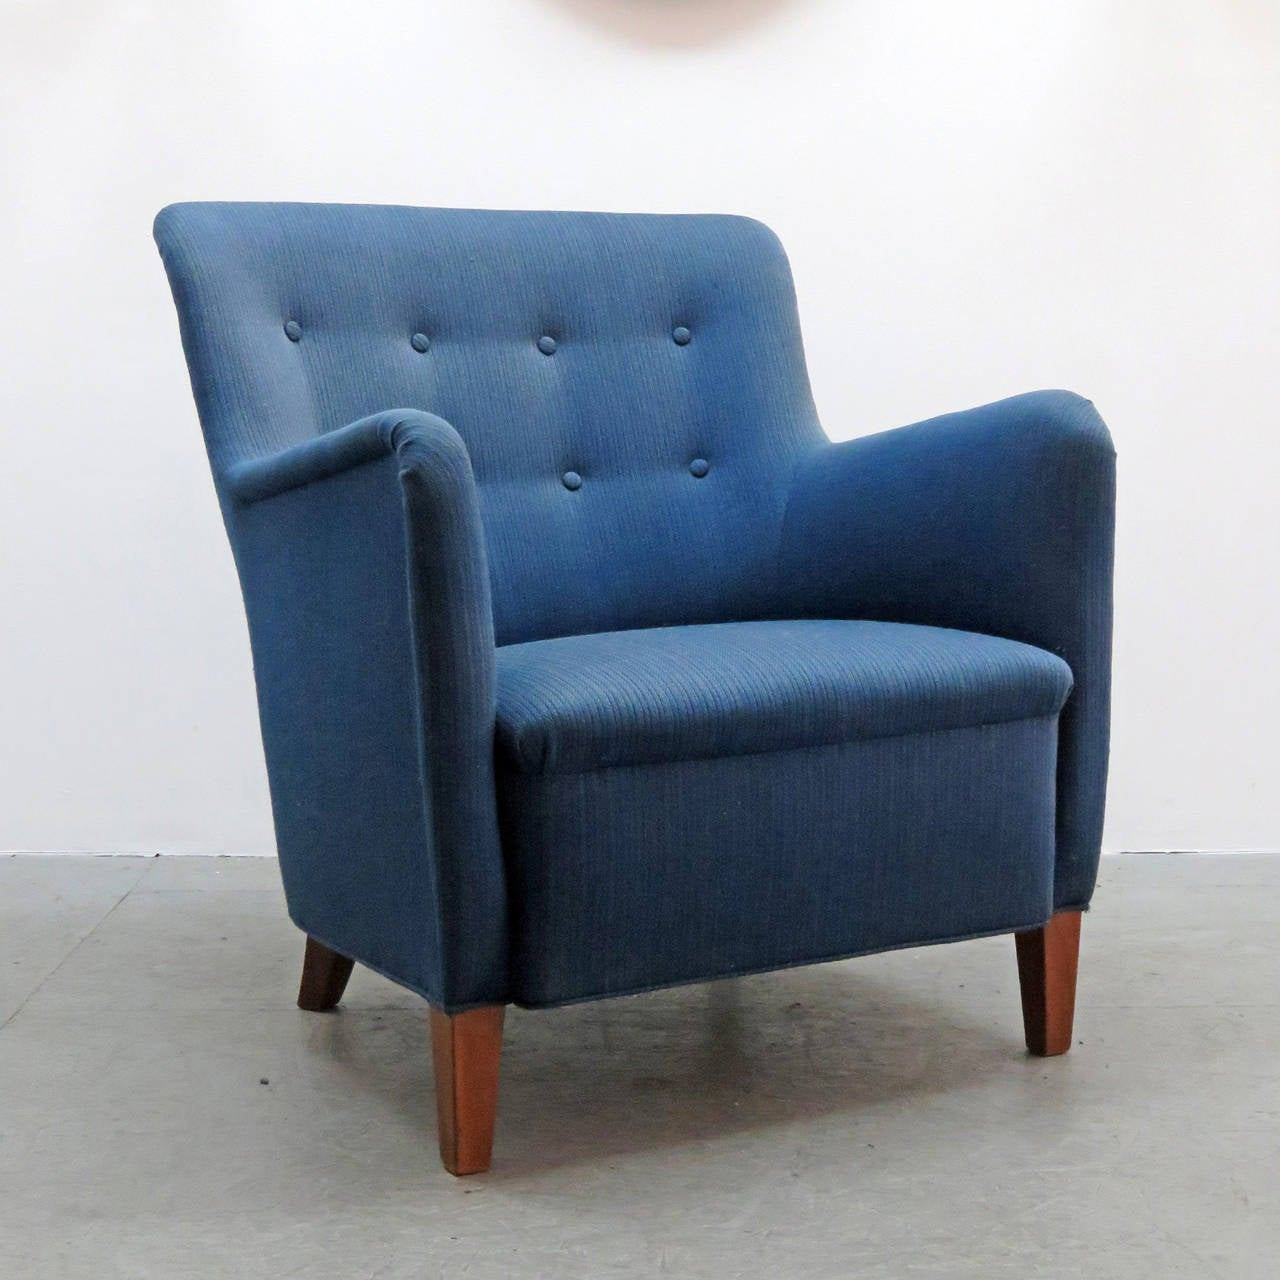 Dansk Mobler Club Chair, 1940 at 1stdibs